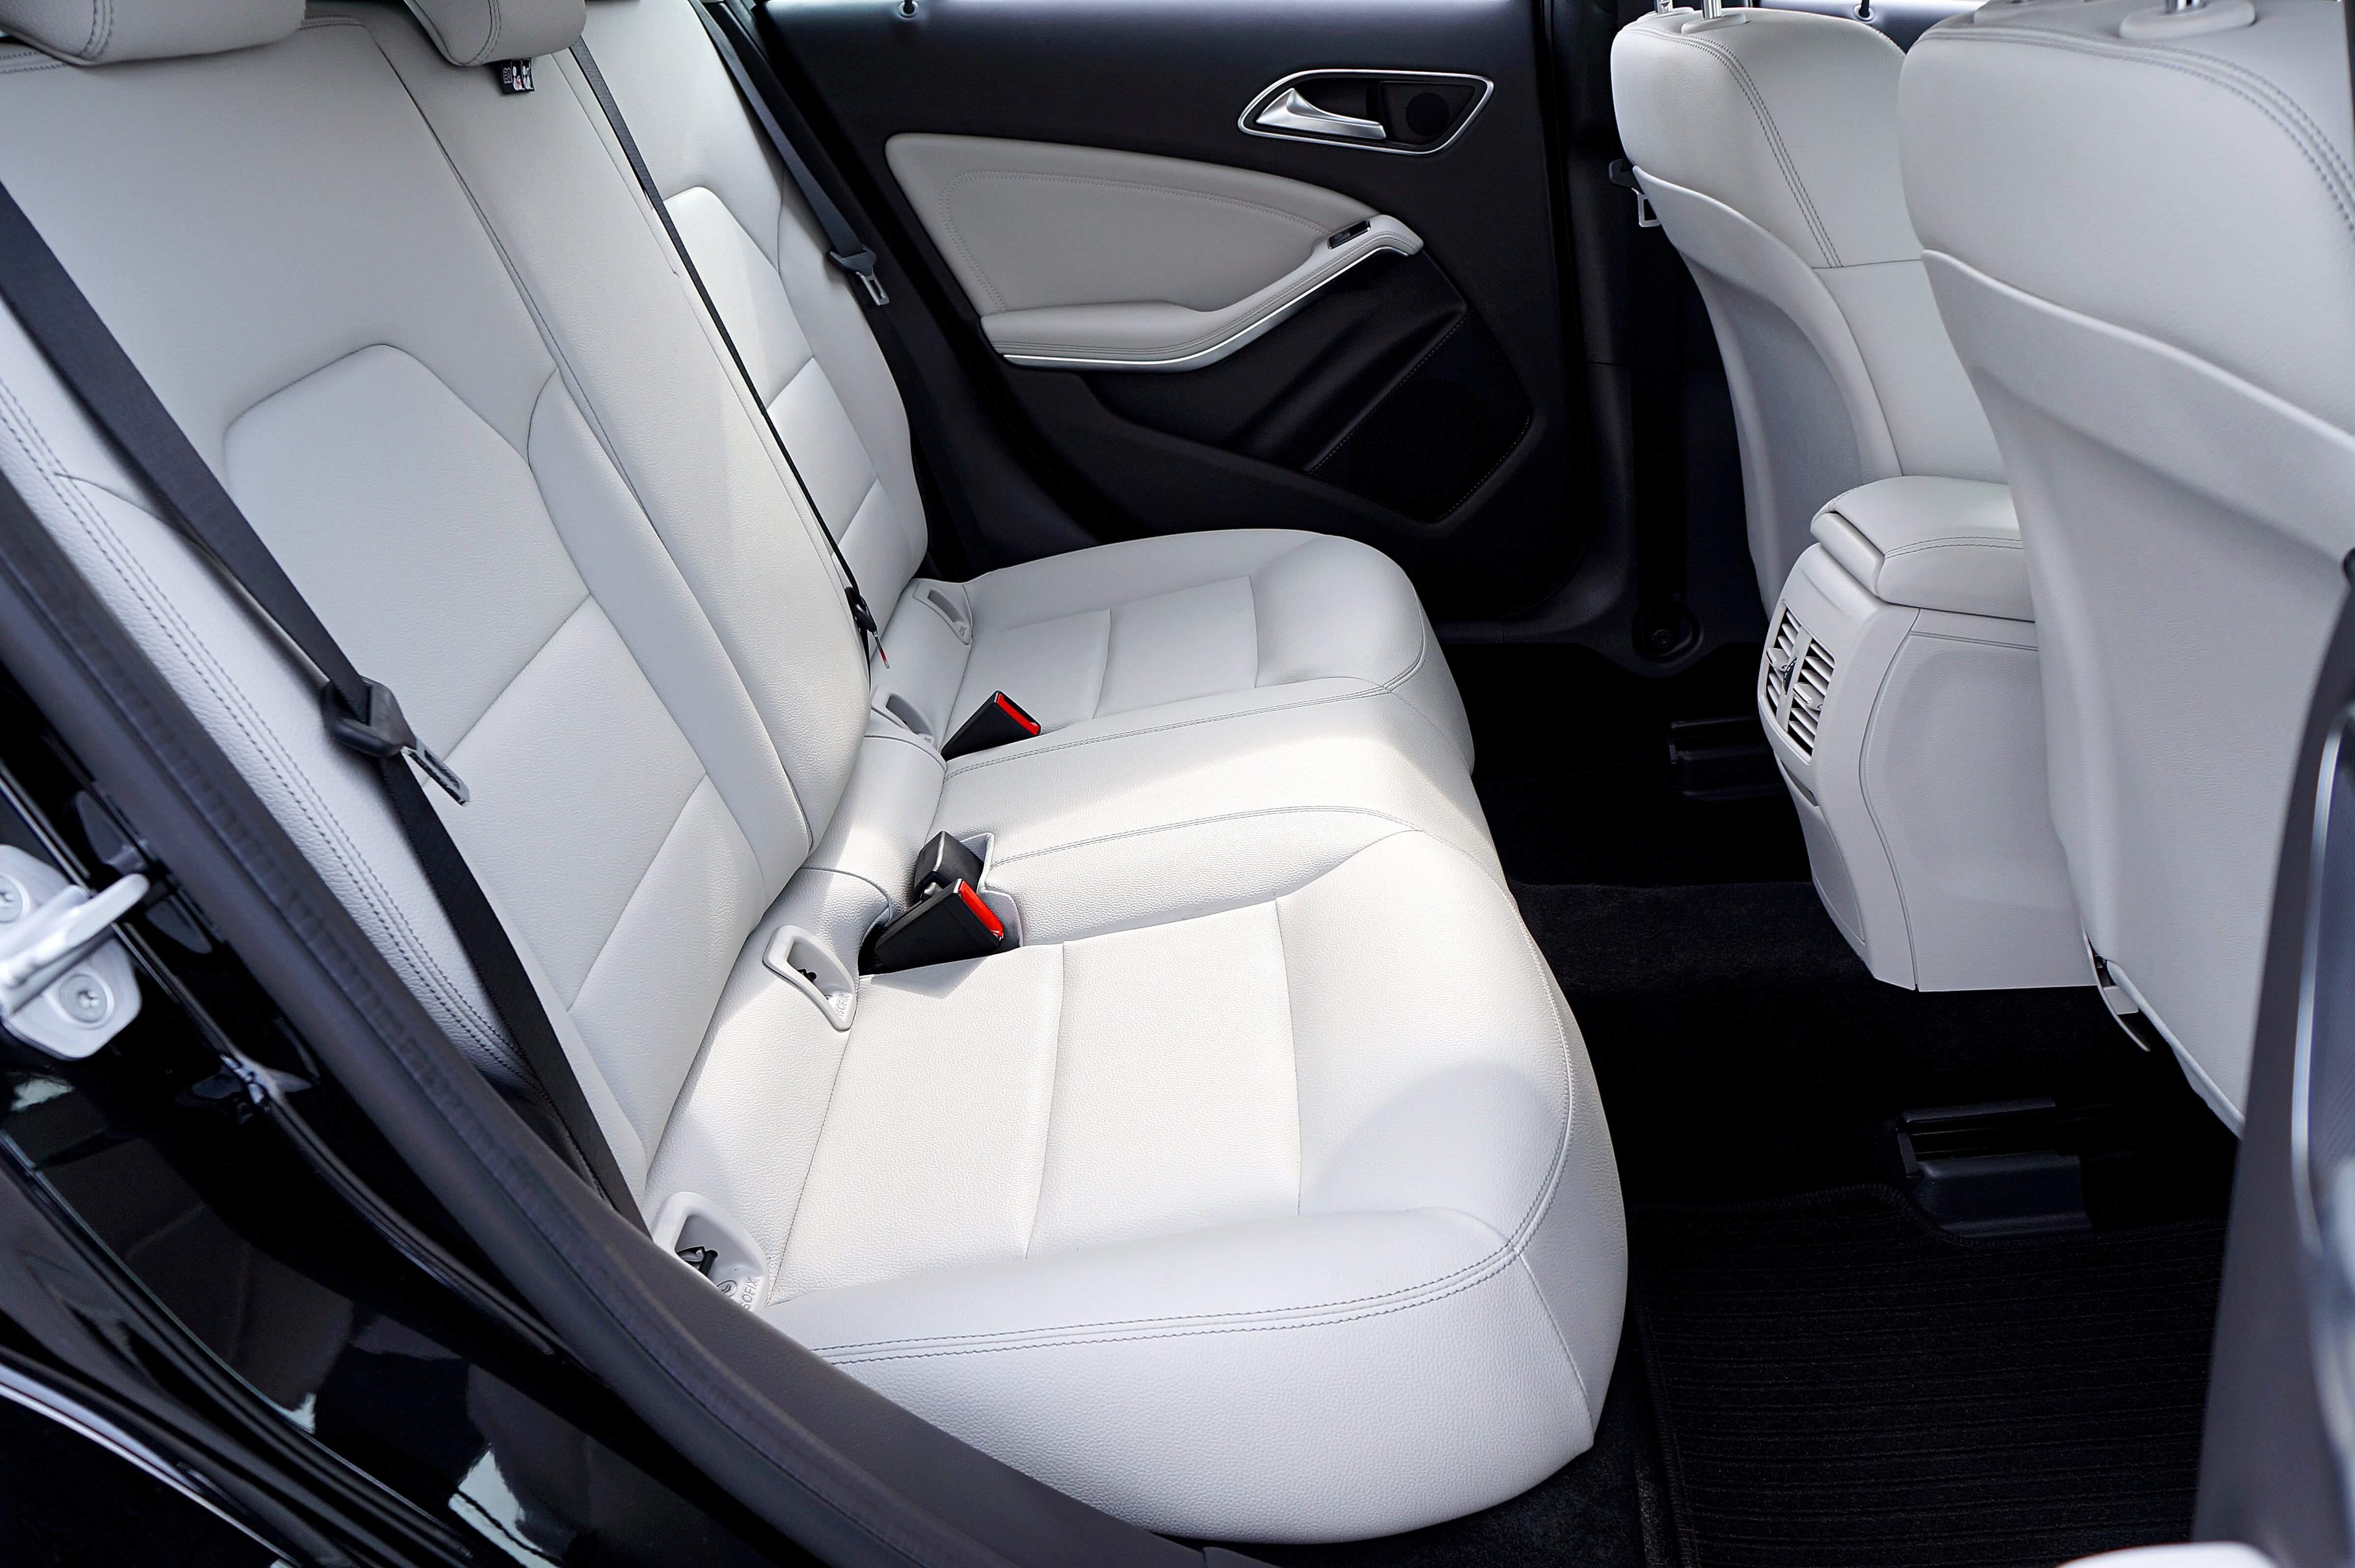 Custom Car Seat Covers in Hawaii